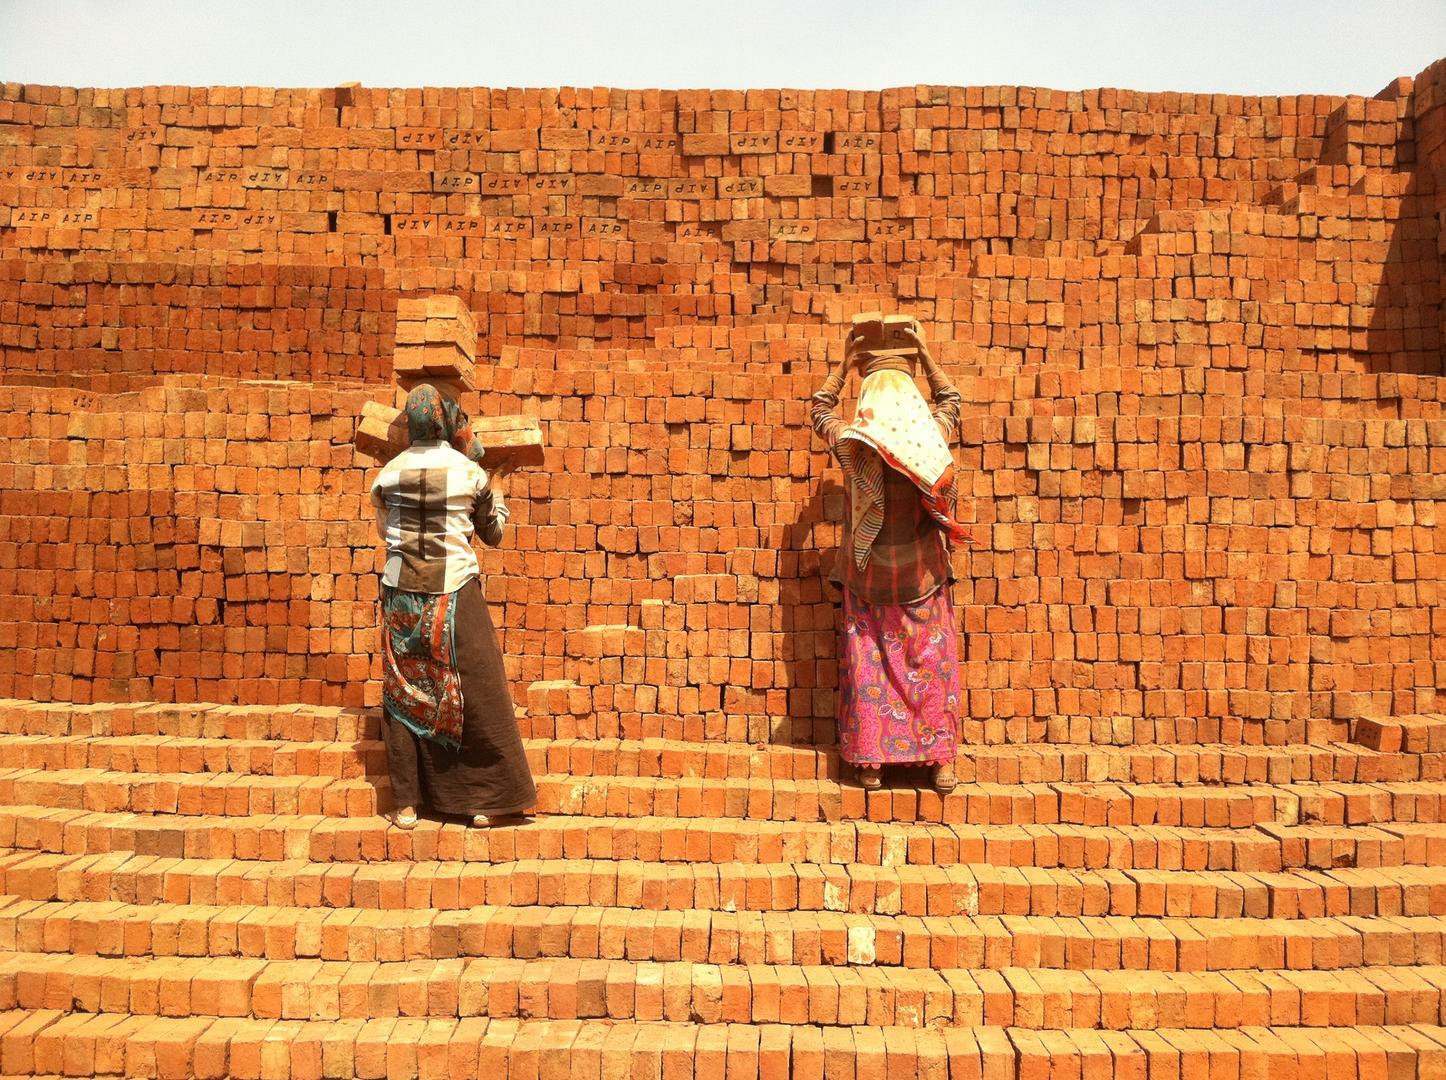 Incredible India - Travel Photo Contest | Photocrowd Photo ...